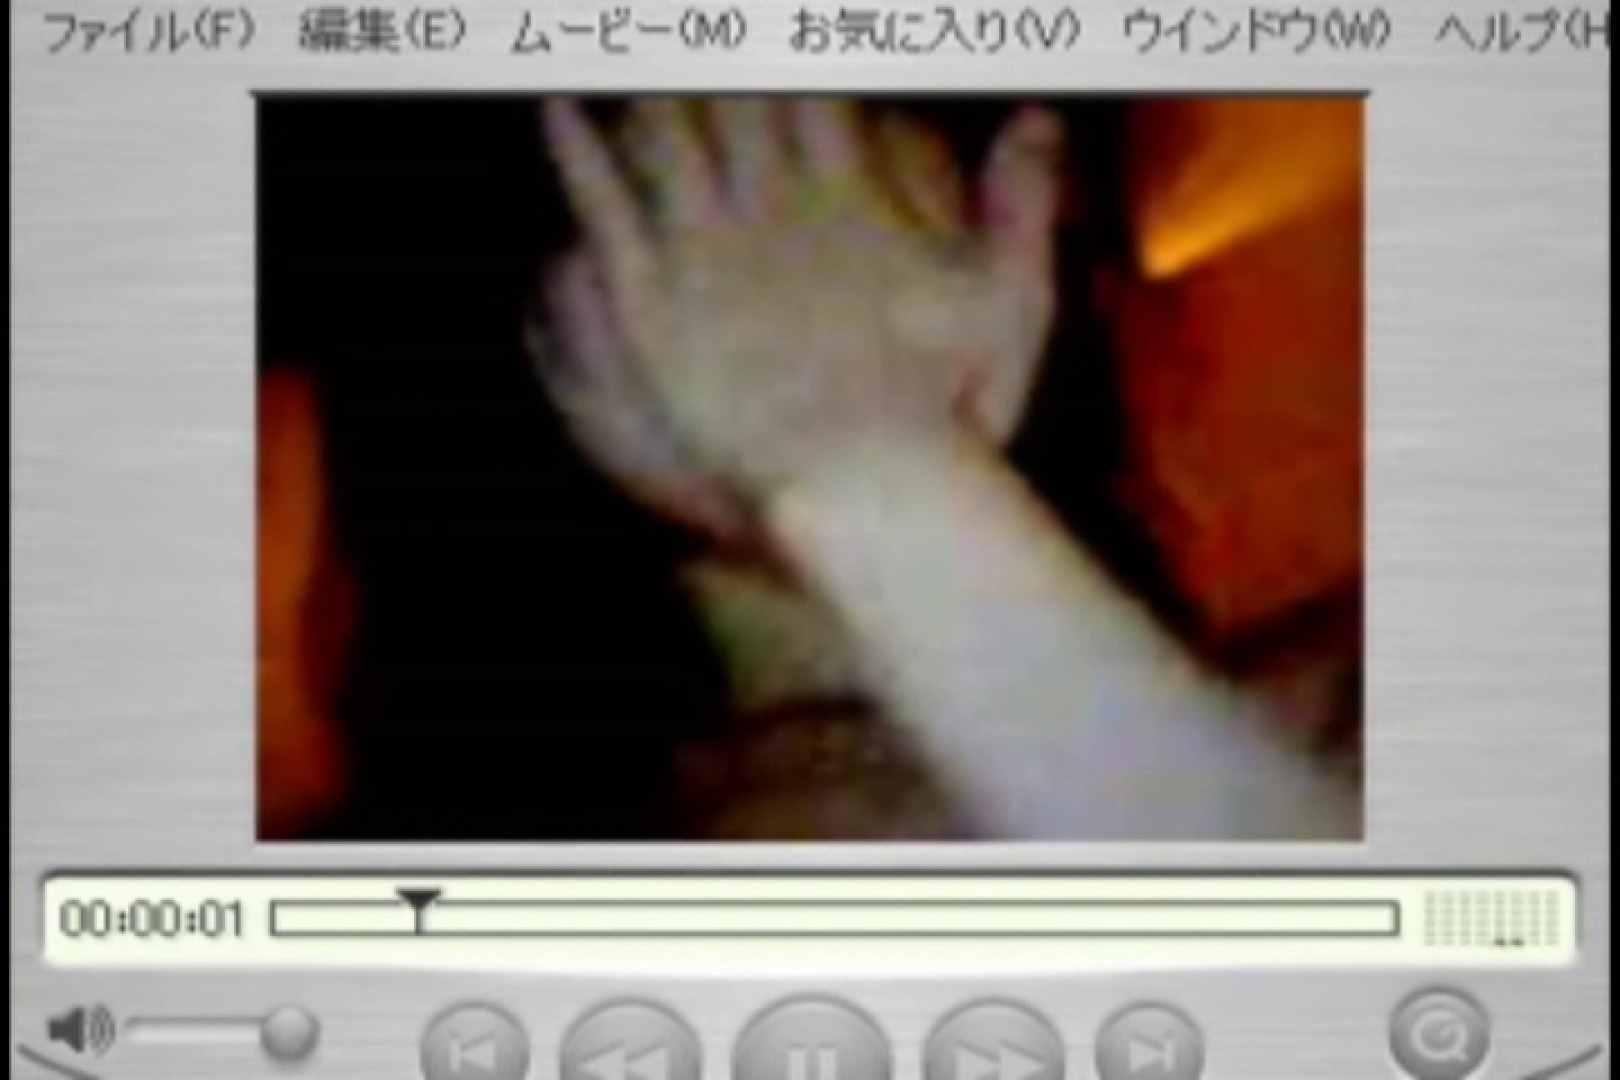 Shigeruのアルバム 流出作品  68pic 24